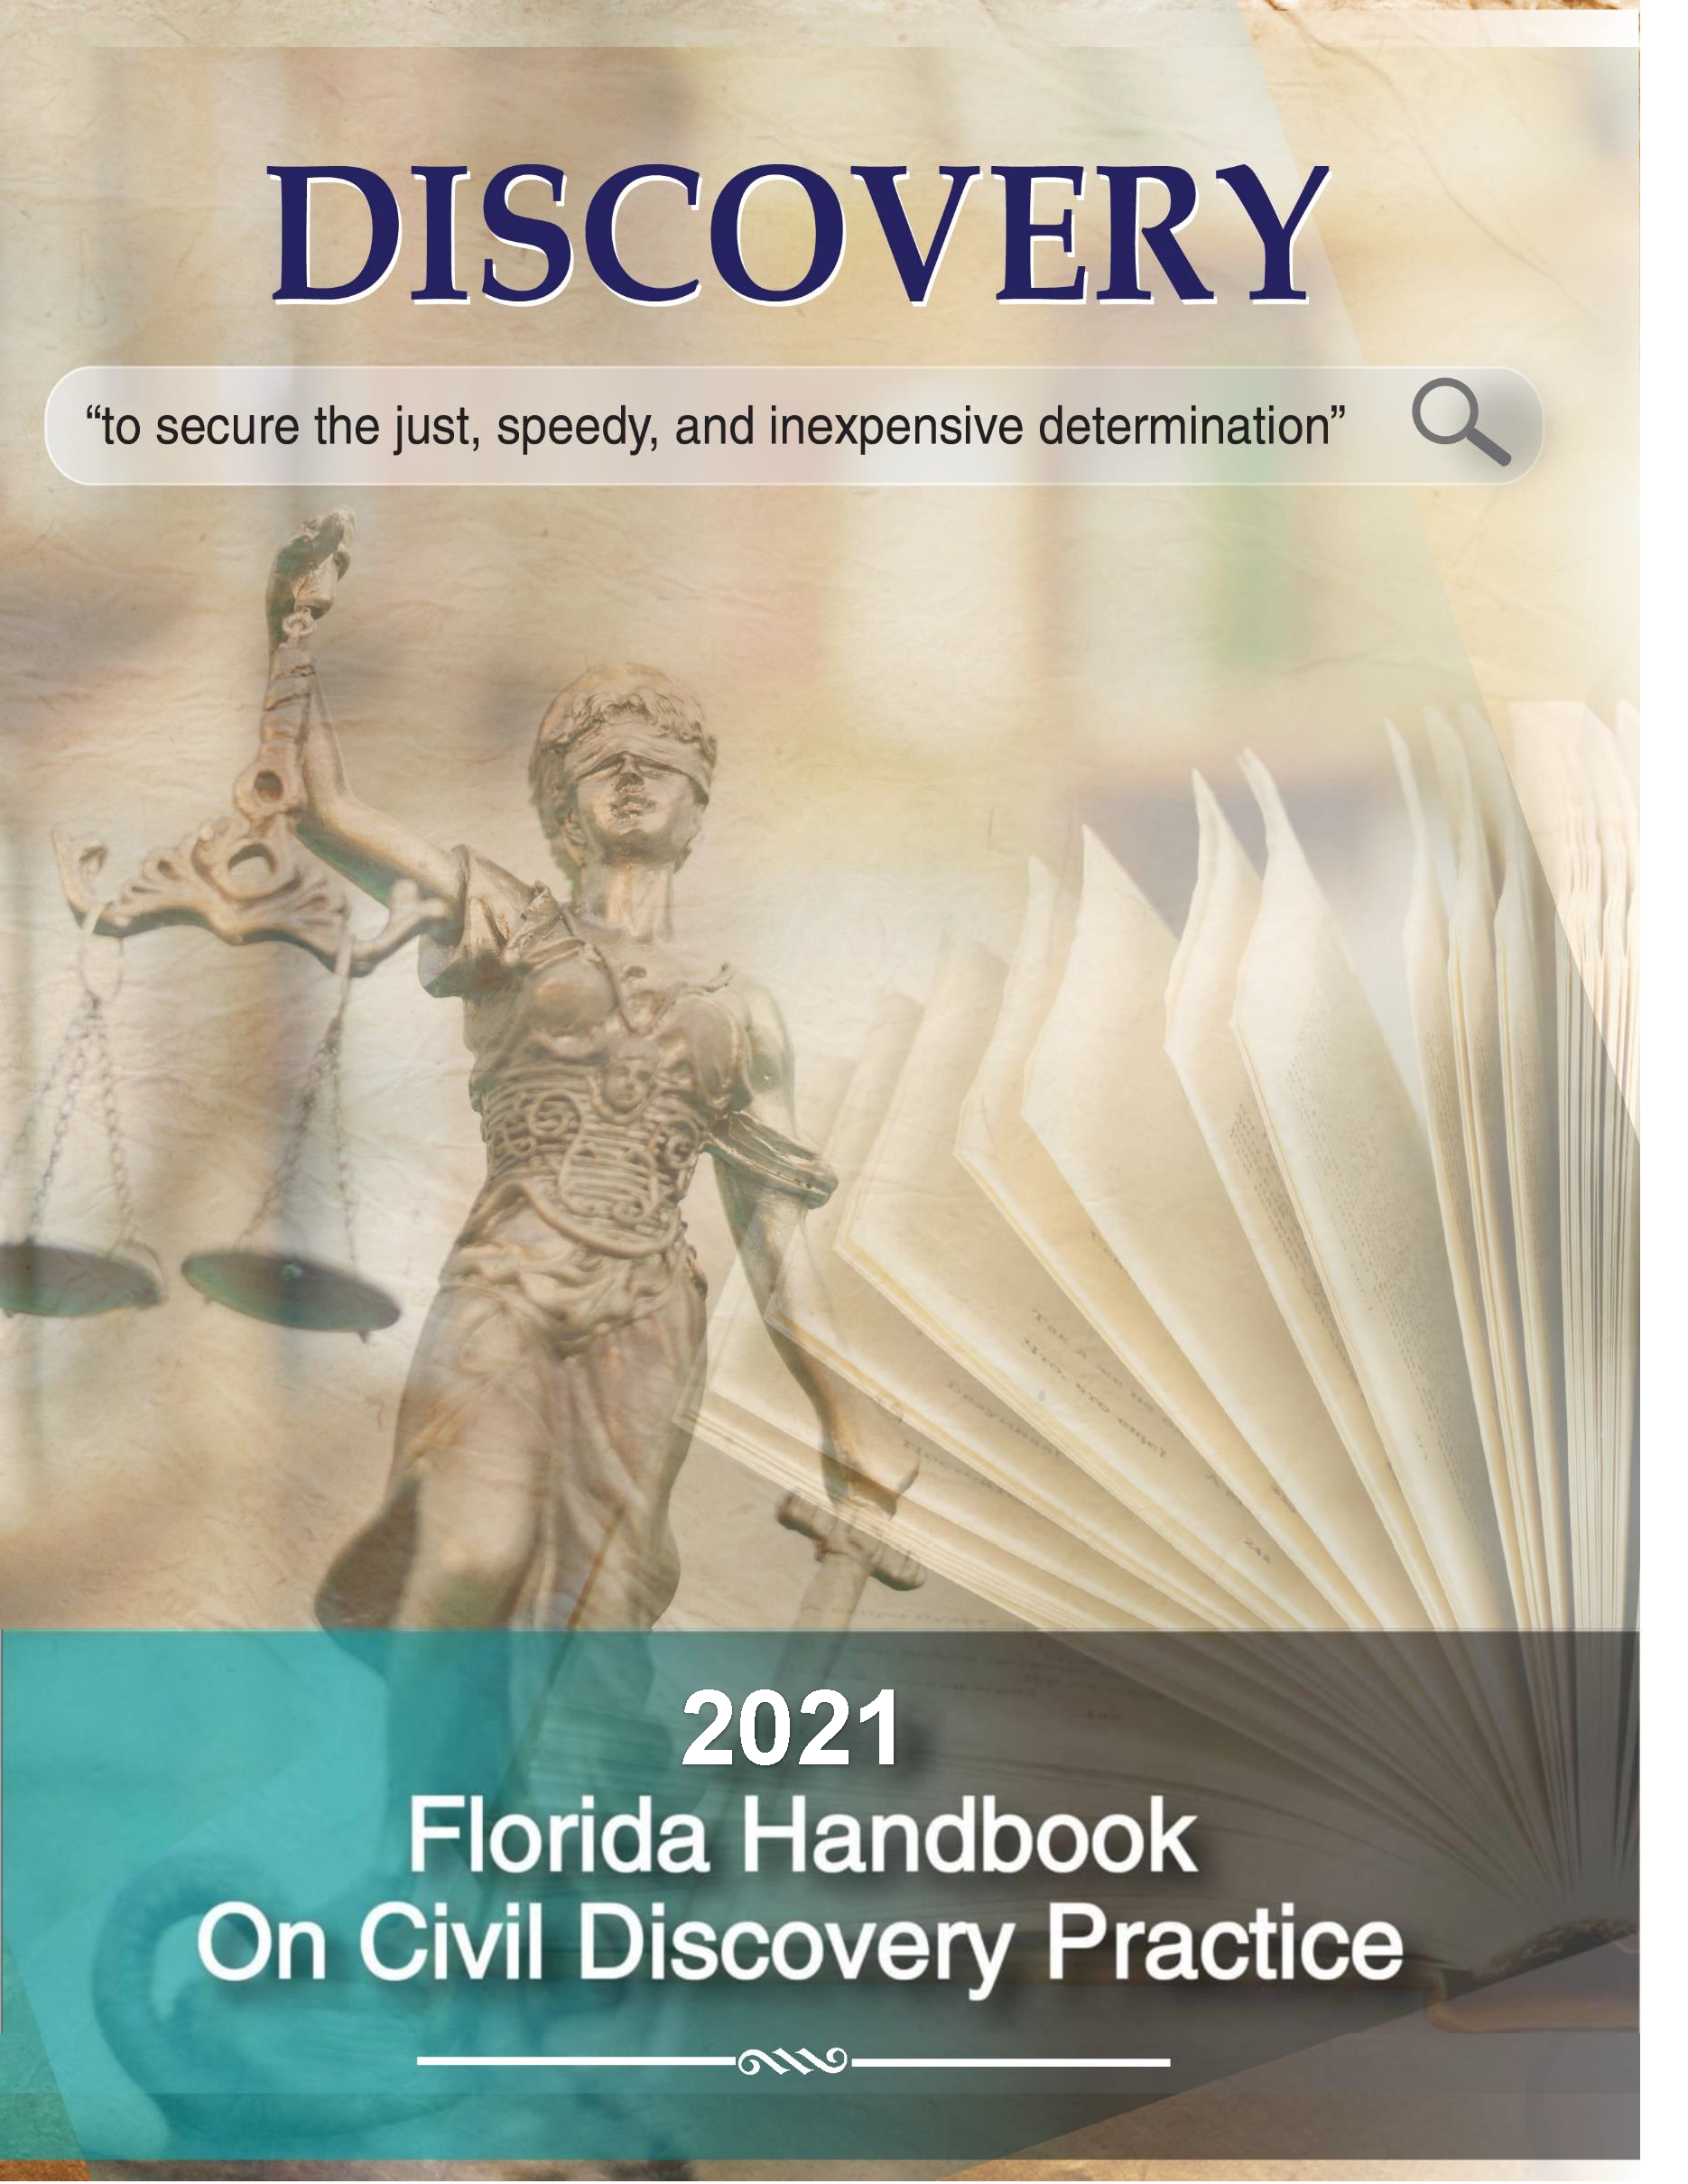 2021 Florida Handbook on Civil Discovery Practice